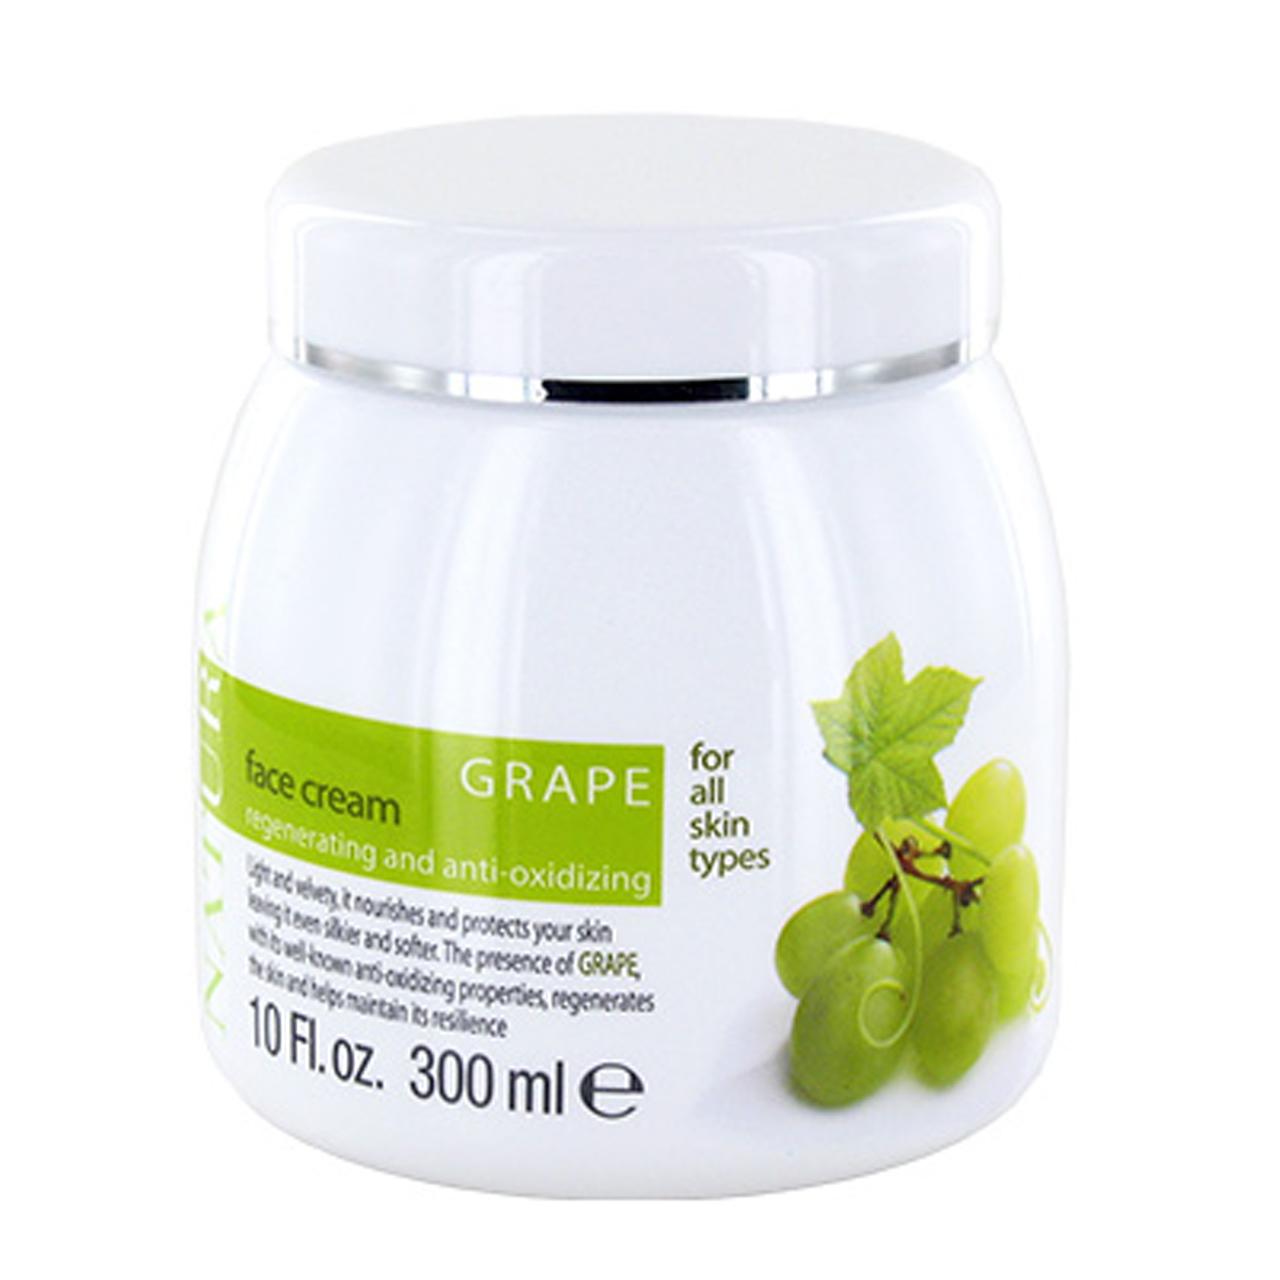 کرم صورت کلیون مدل Grape Face Cream حجم 300 میلی لیتر